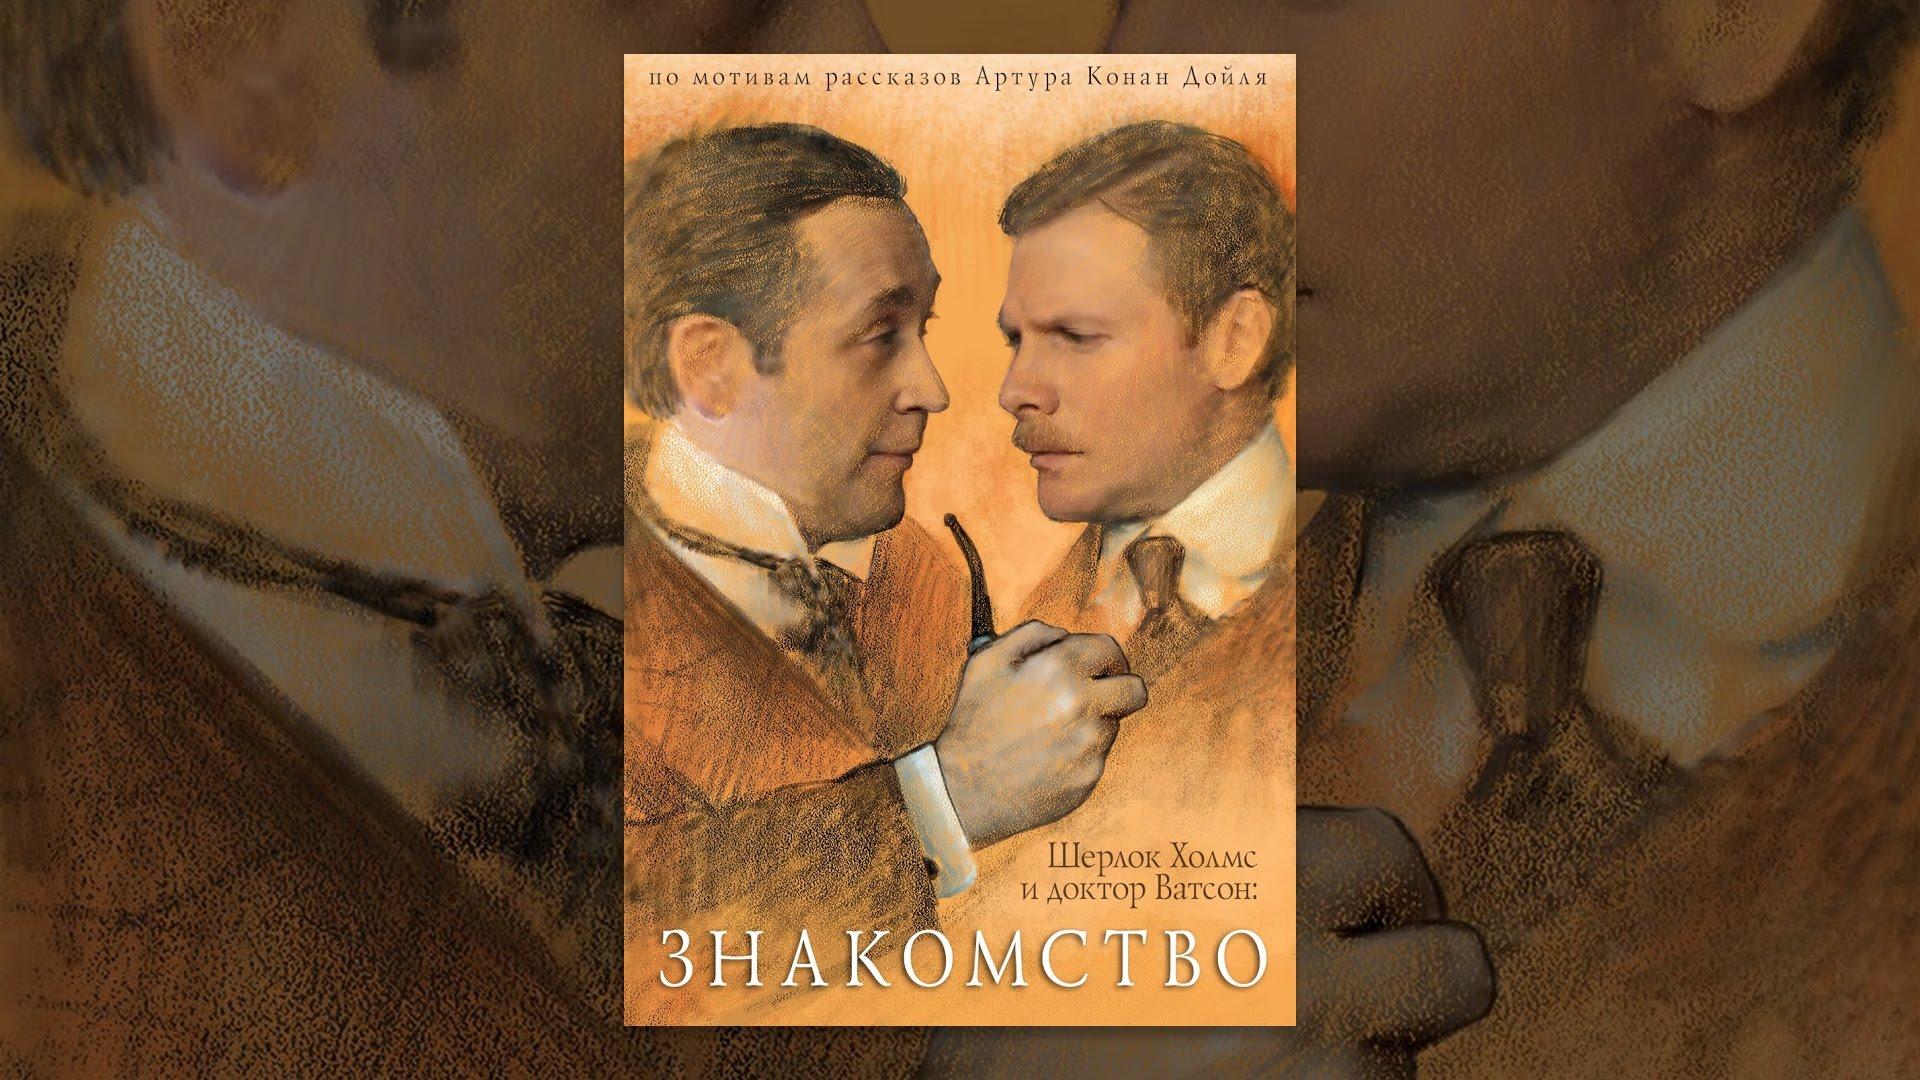 Шерлок холмс и доктор ватсон знакомство 2018